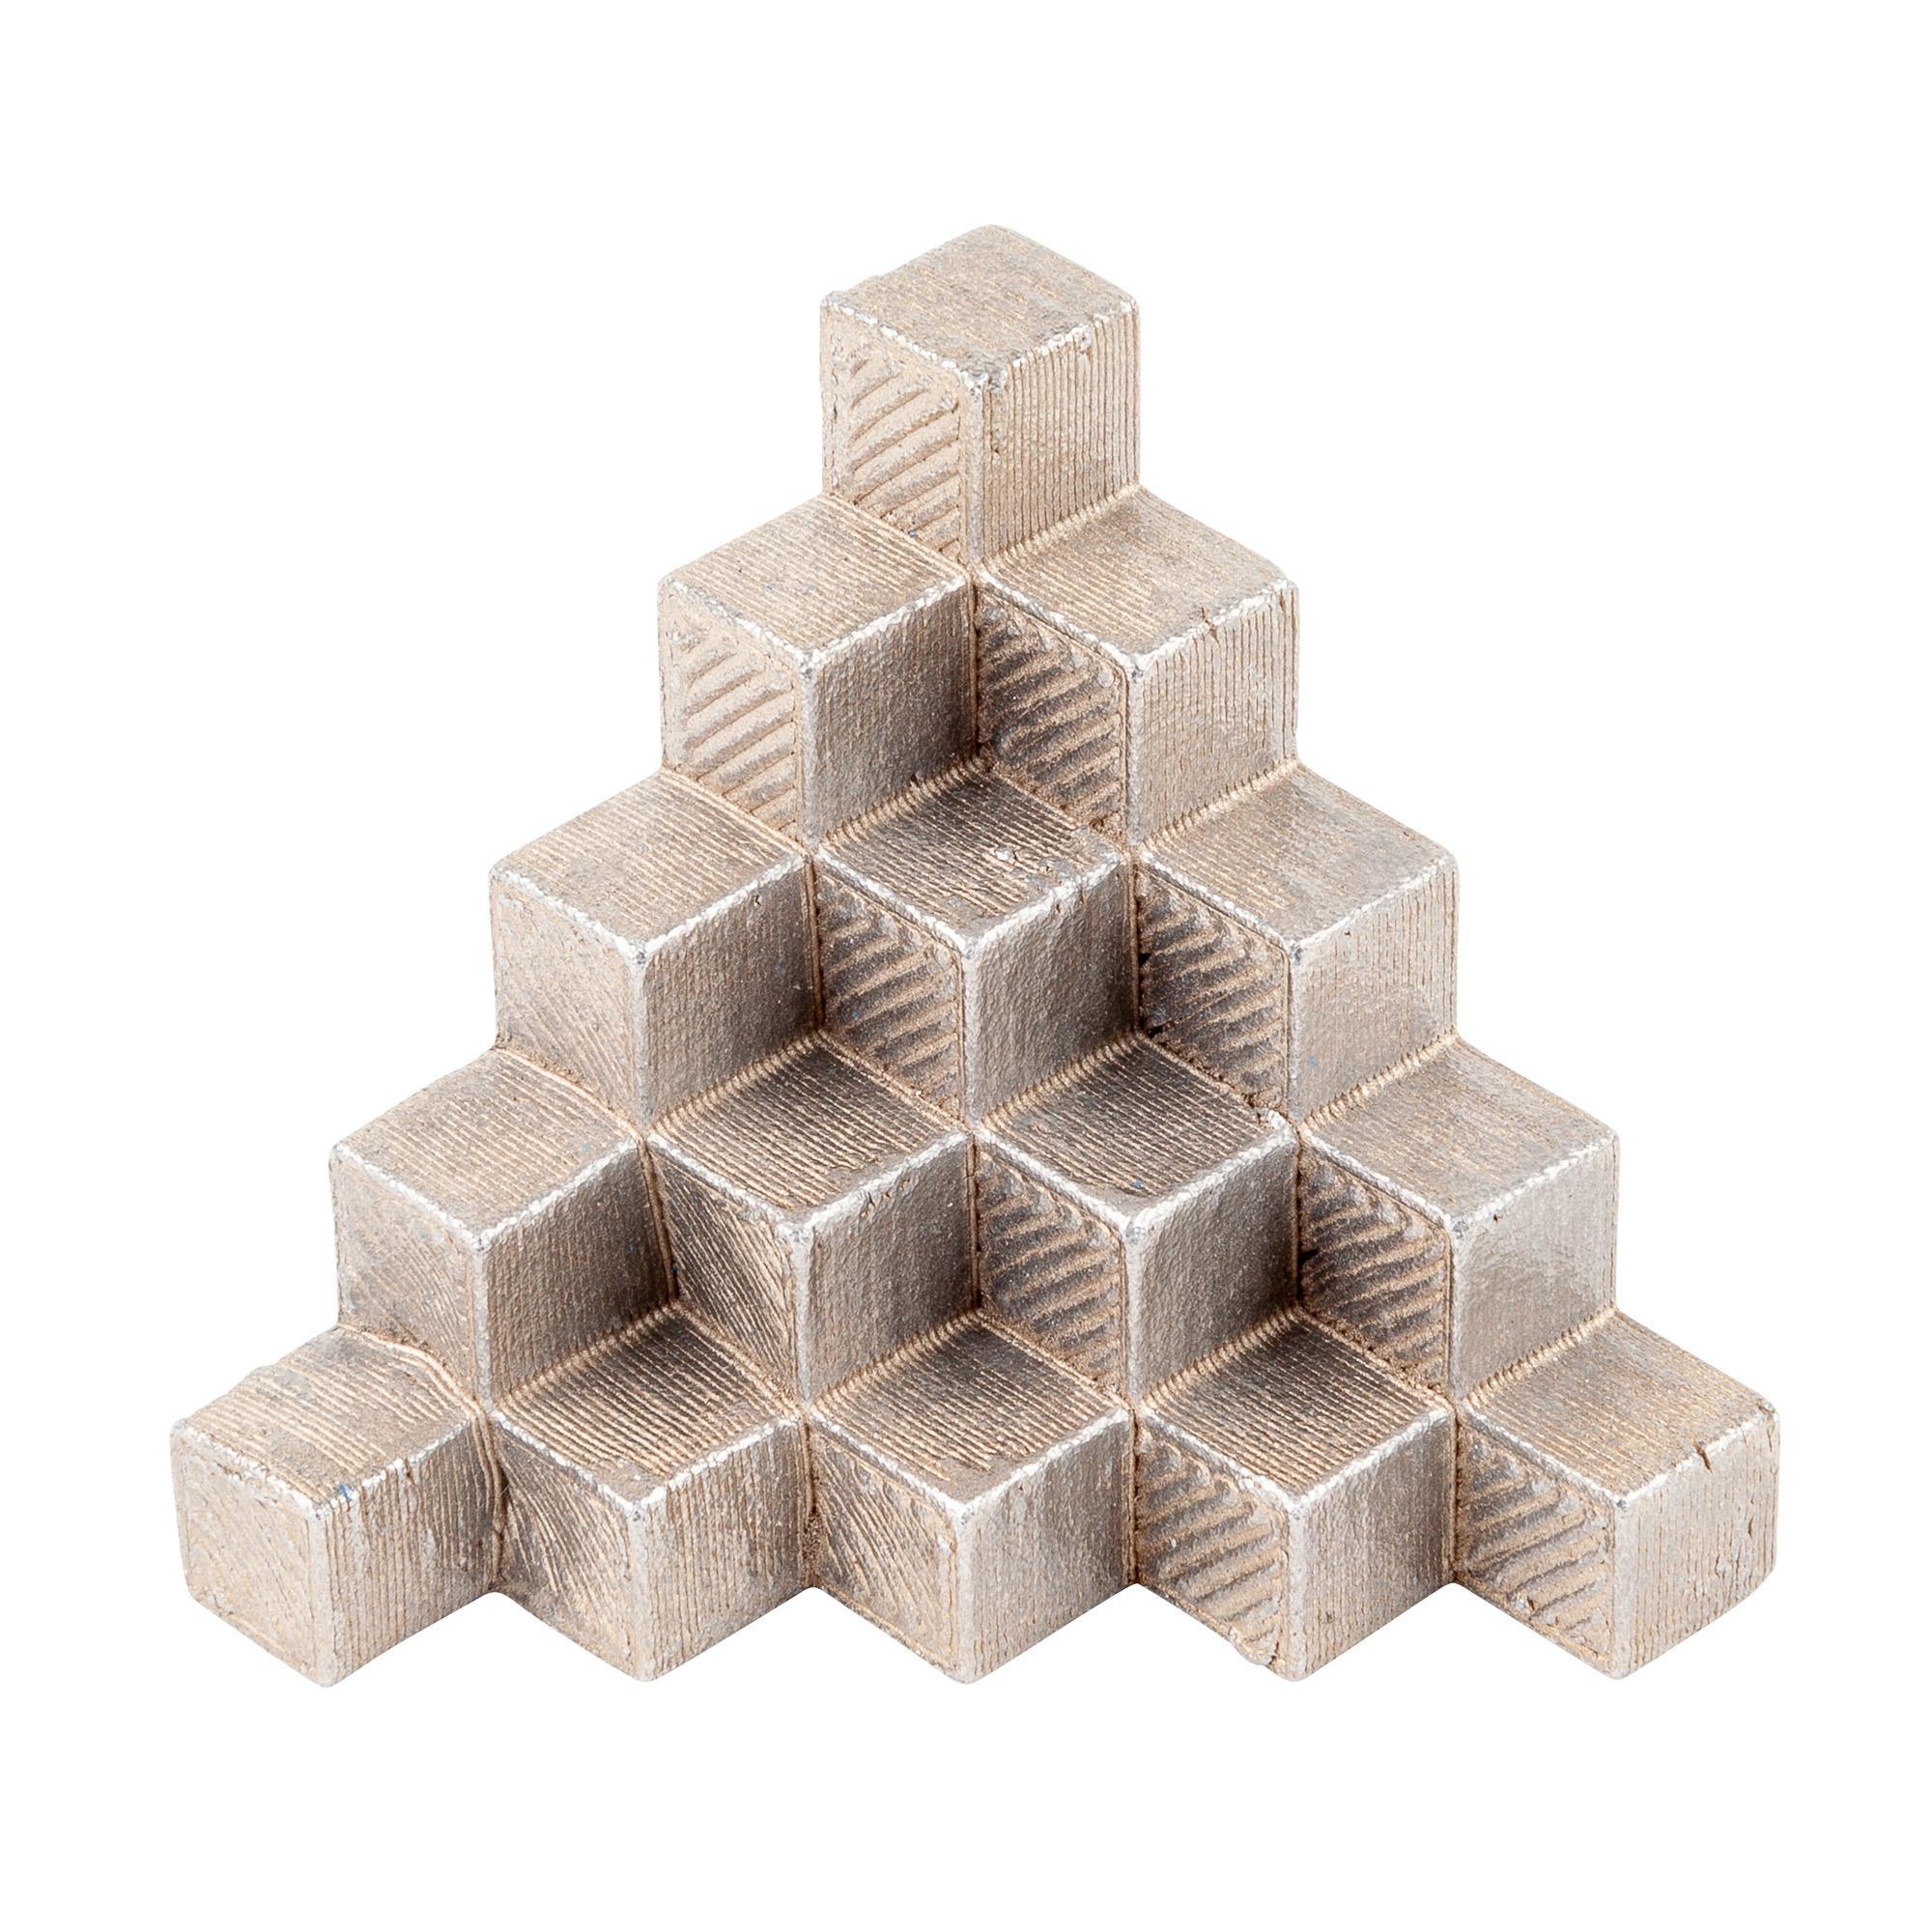 Cube_Pyramid_Clipped-8969.jpg